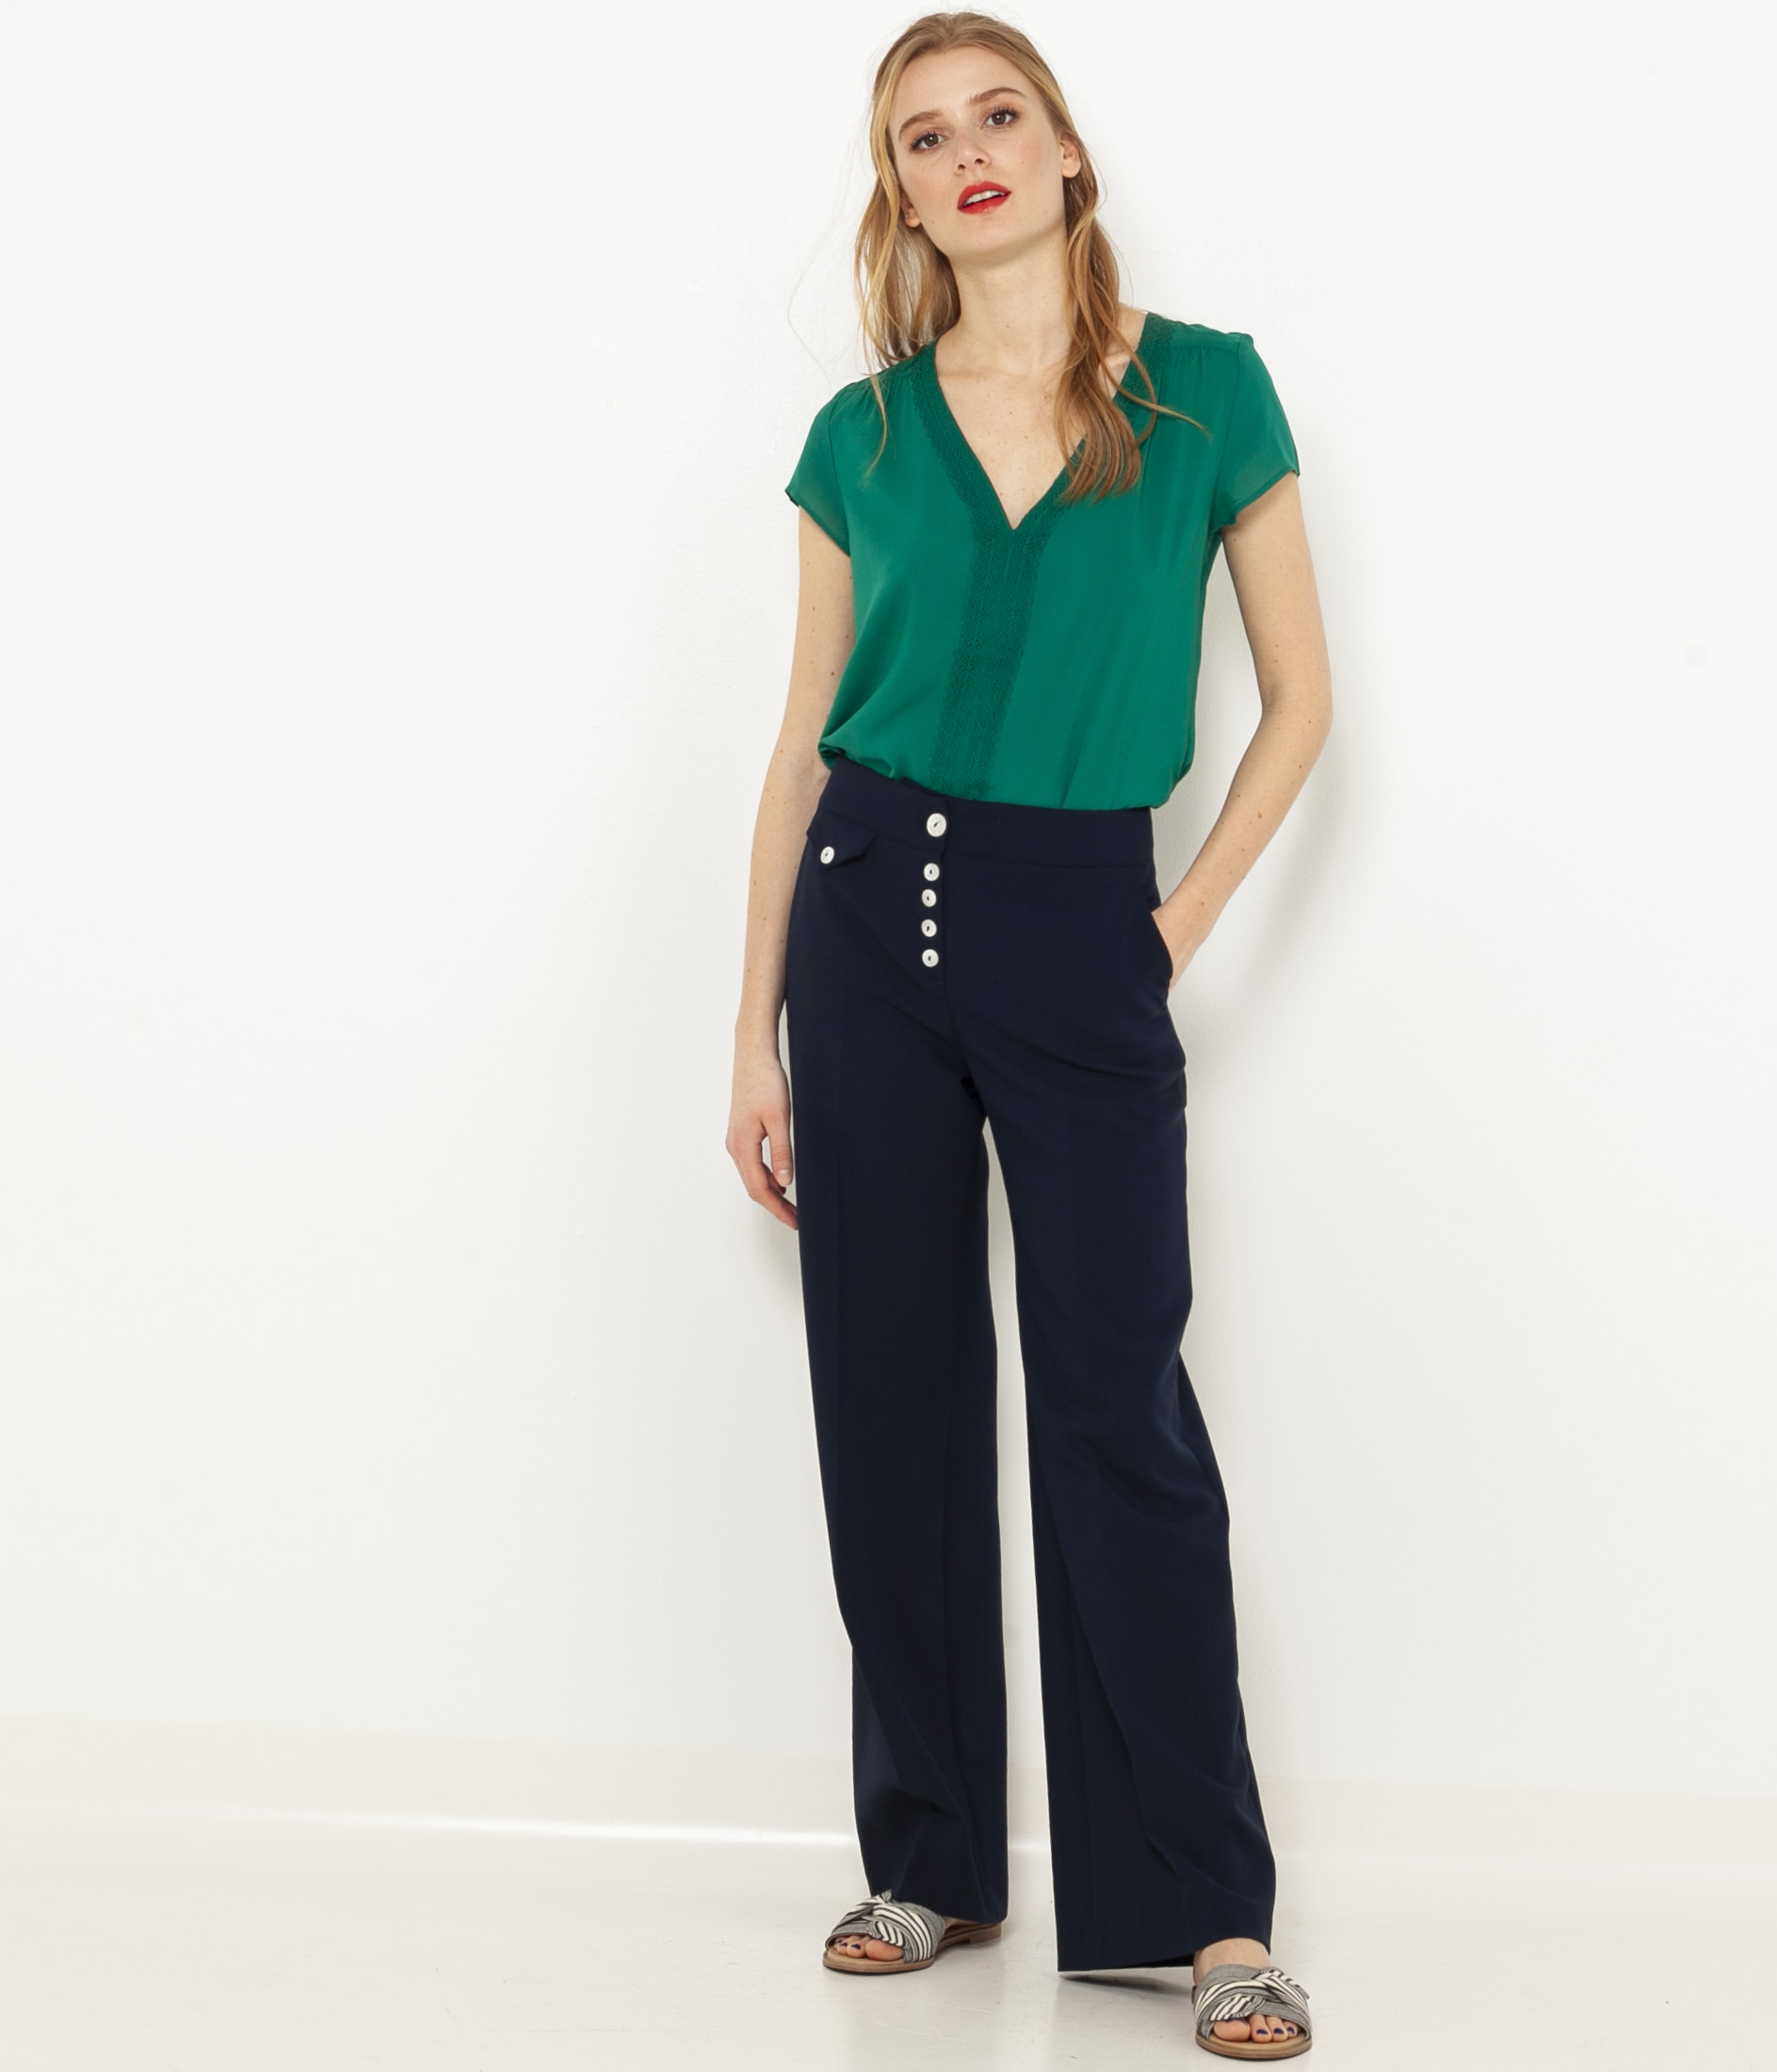 CAMAIEU Bluzka damska zielony